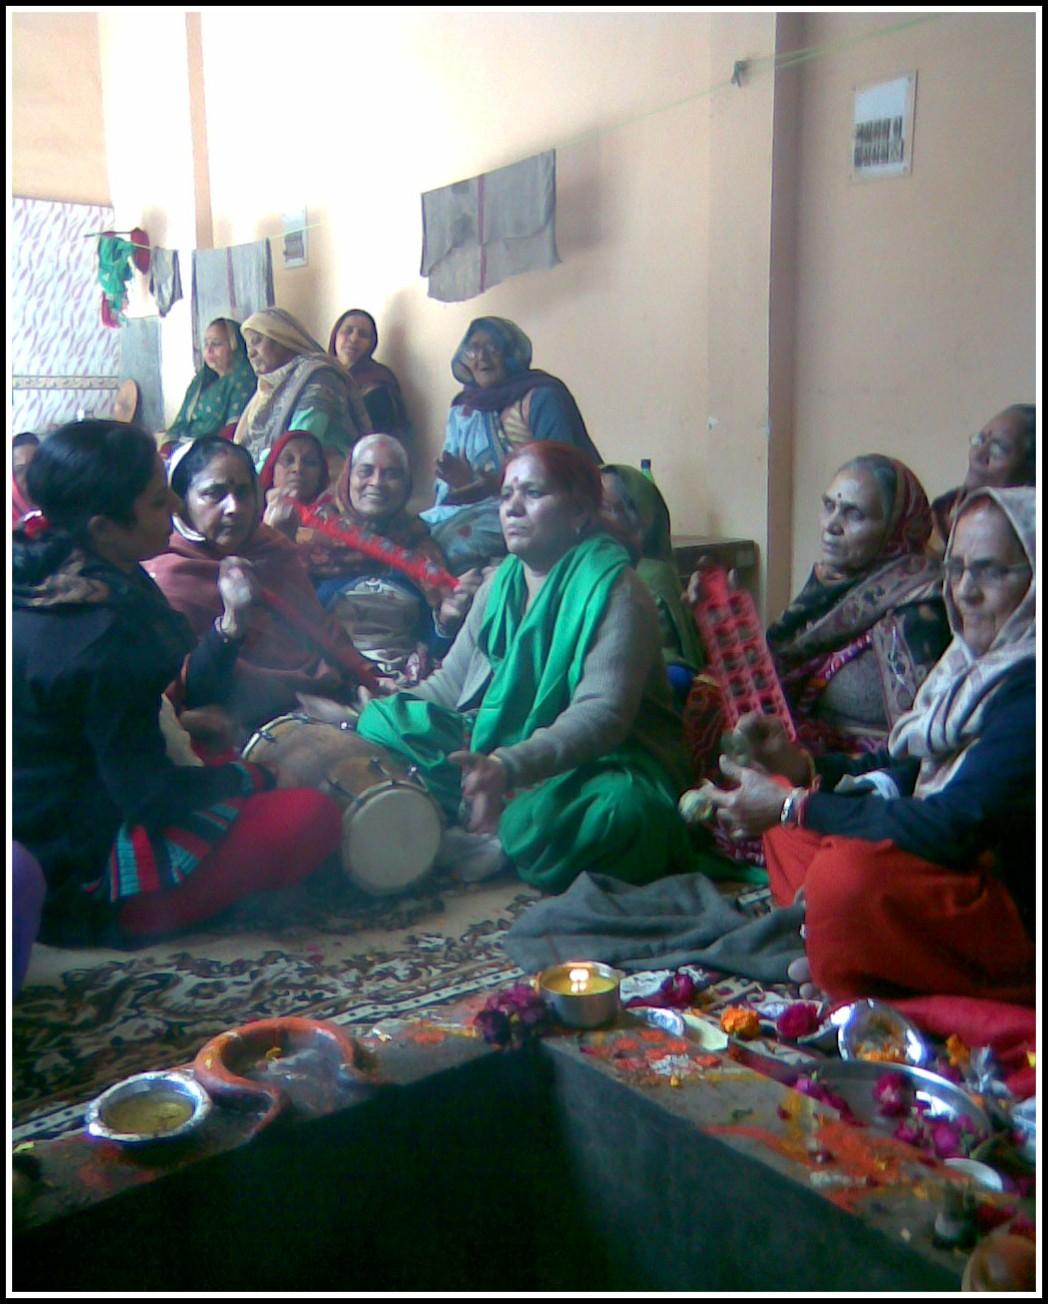 Kirtan Mandli Singing and playing Instruments